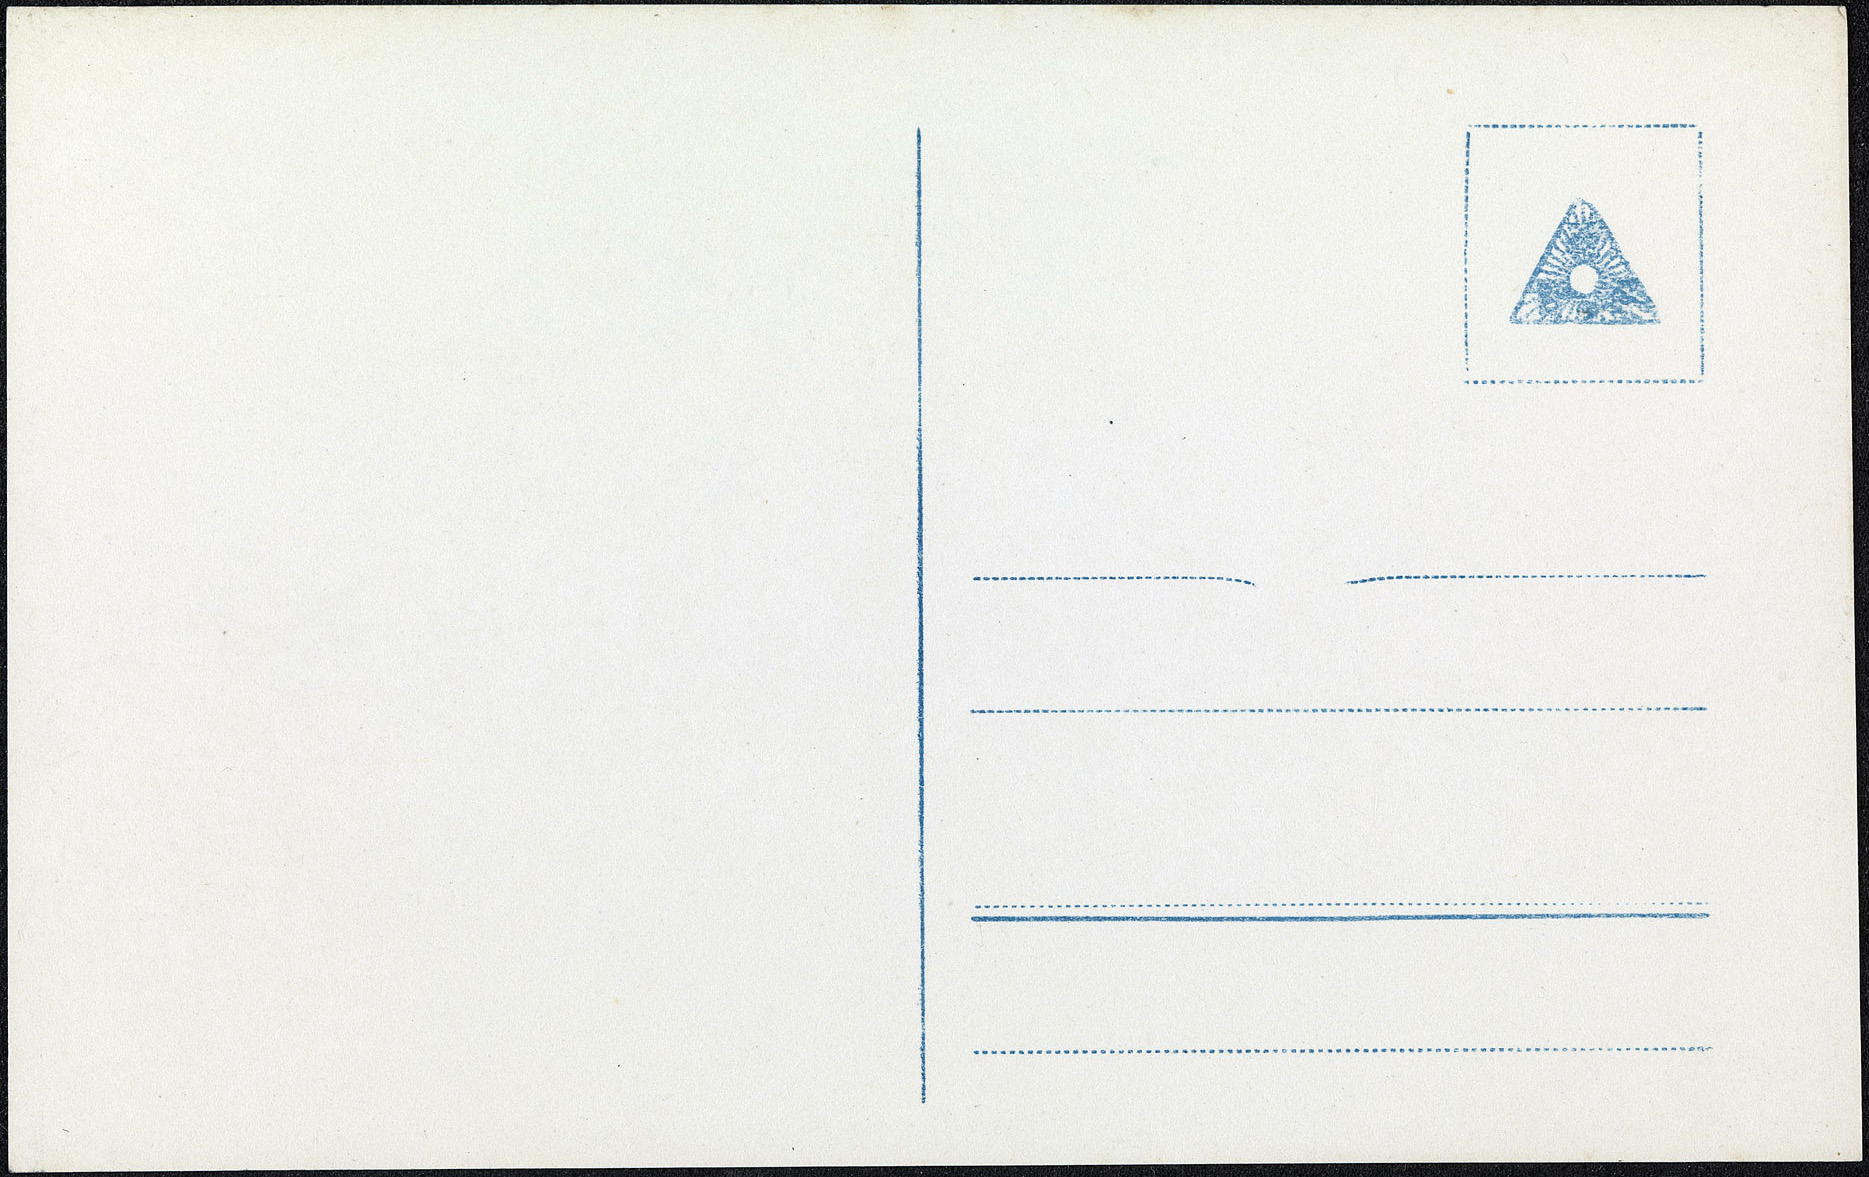 Bakside. Utgiver: Neue Photographische Gesellschaft (NPG), ca. 1920, fotograf: ukjent